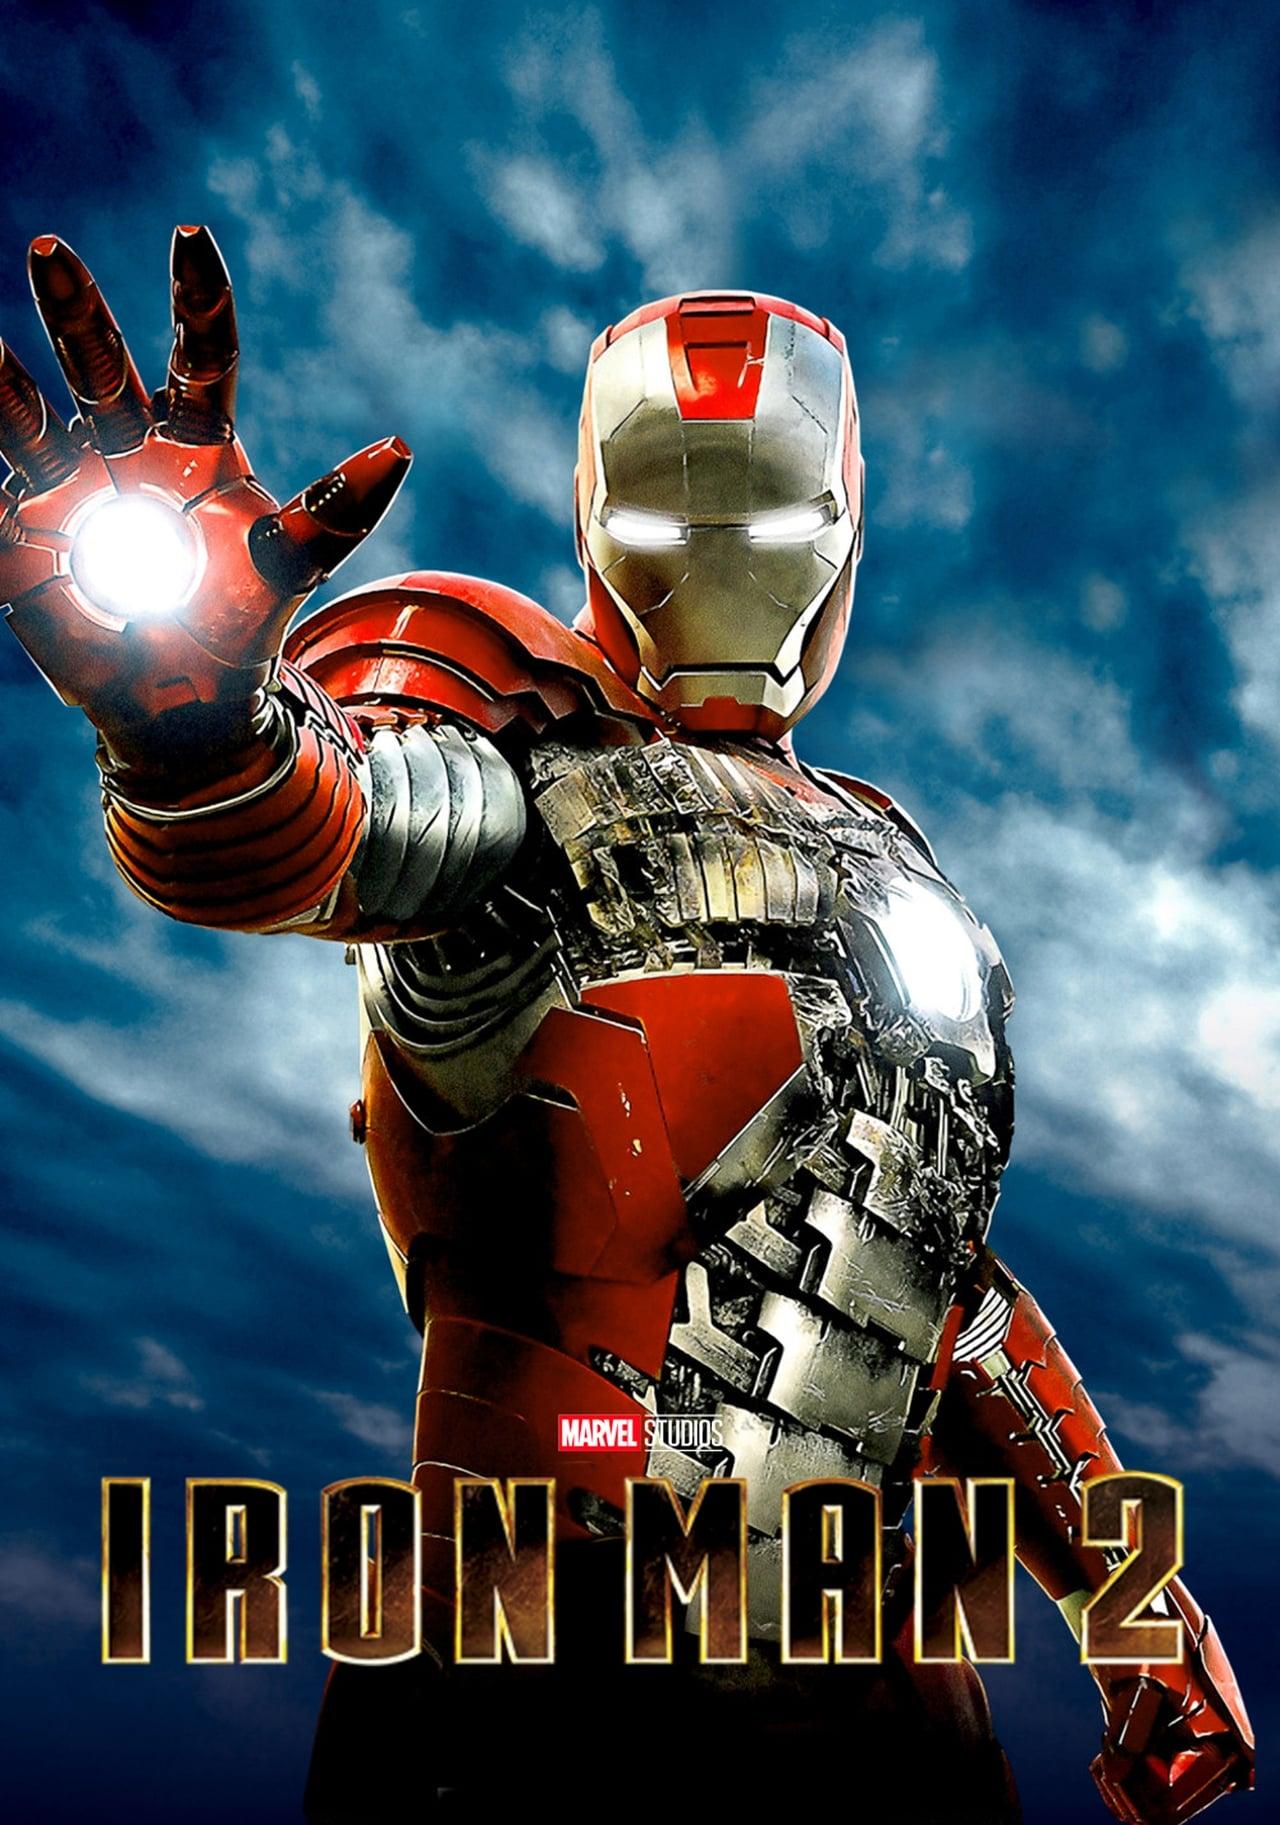 Iron Man 2 Movie Still - Wallpaper, High Definition, High